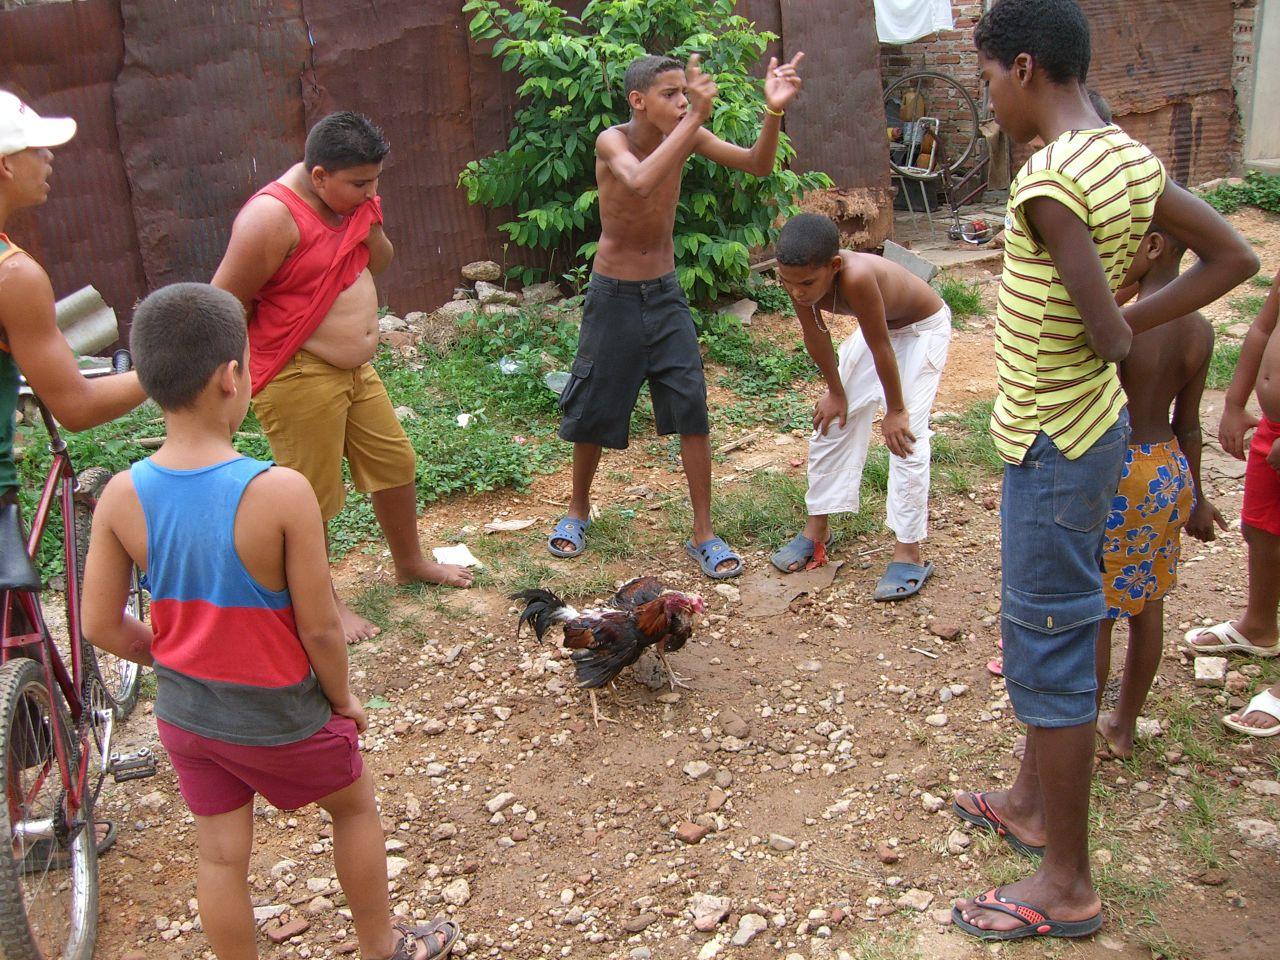 Cuba: fotos del acontecer diario 763843953_5f180cf6b0_o